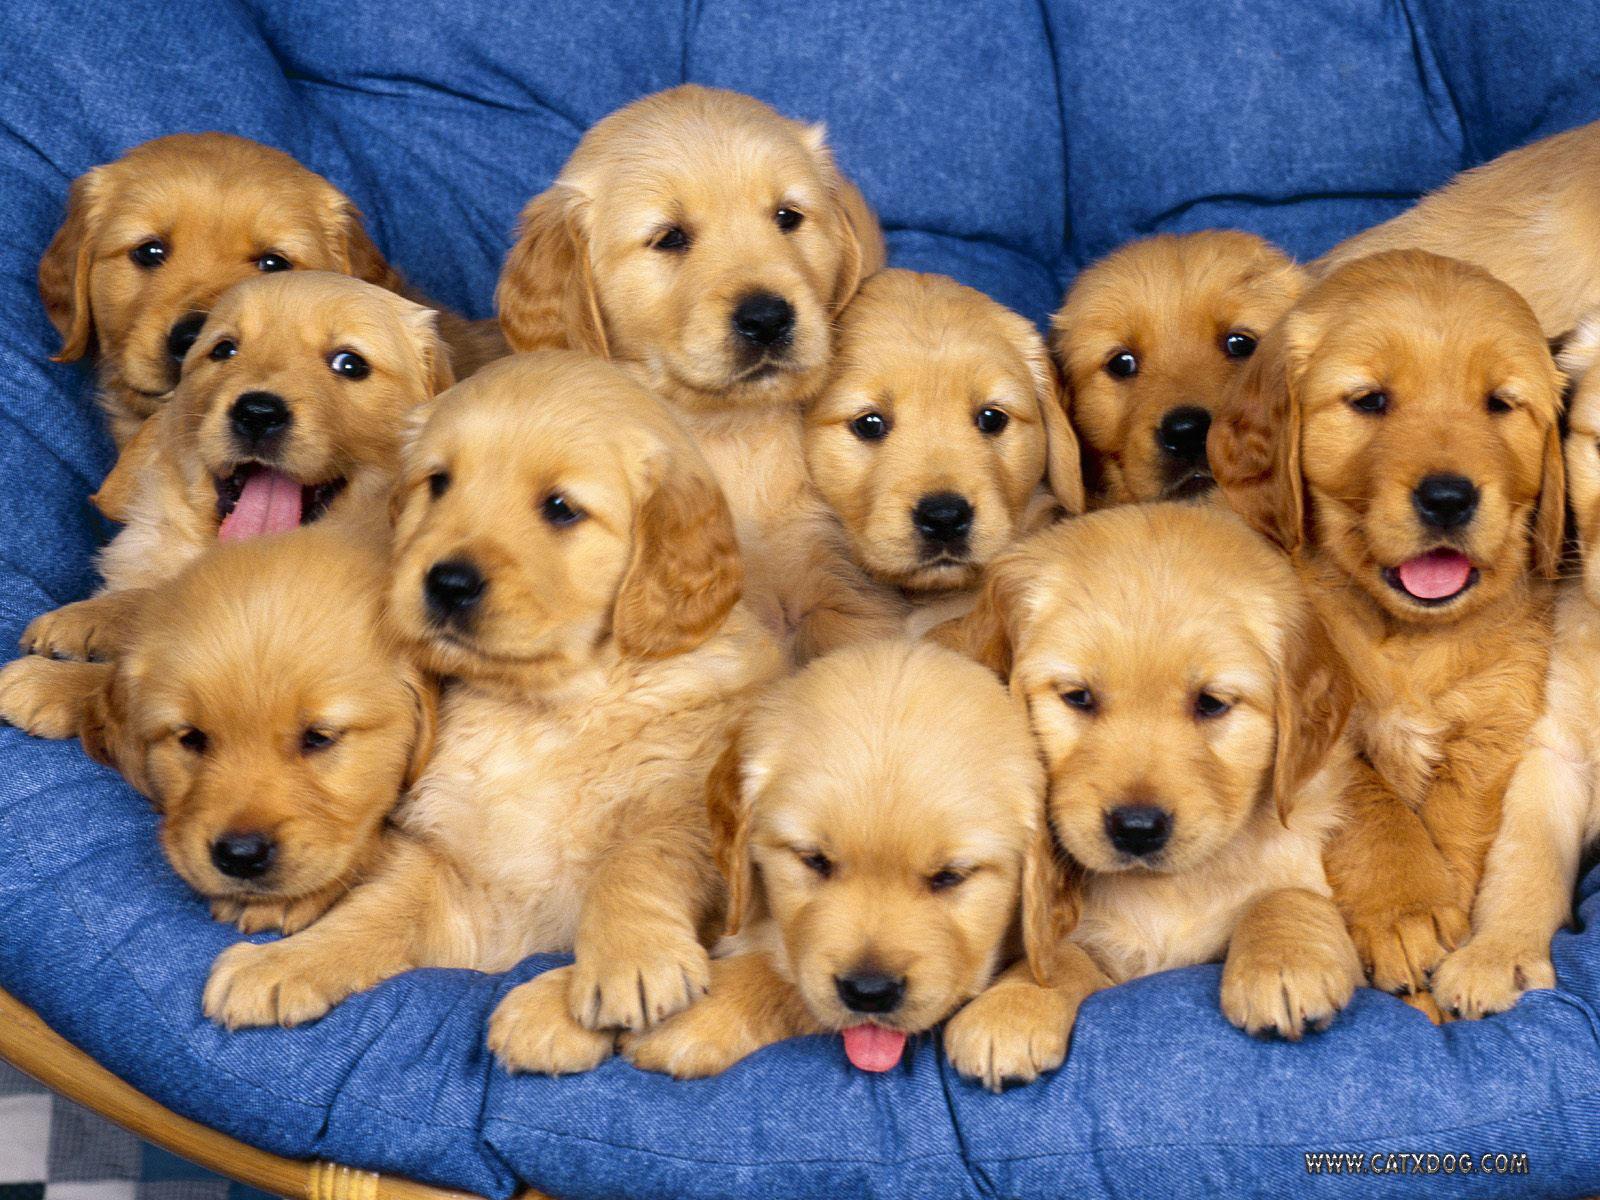 Puppies Desktop Wallpaper Everything Best Dogs 1600x1200